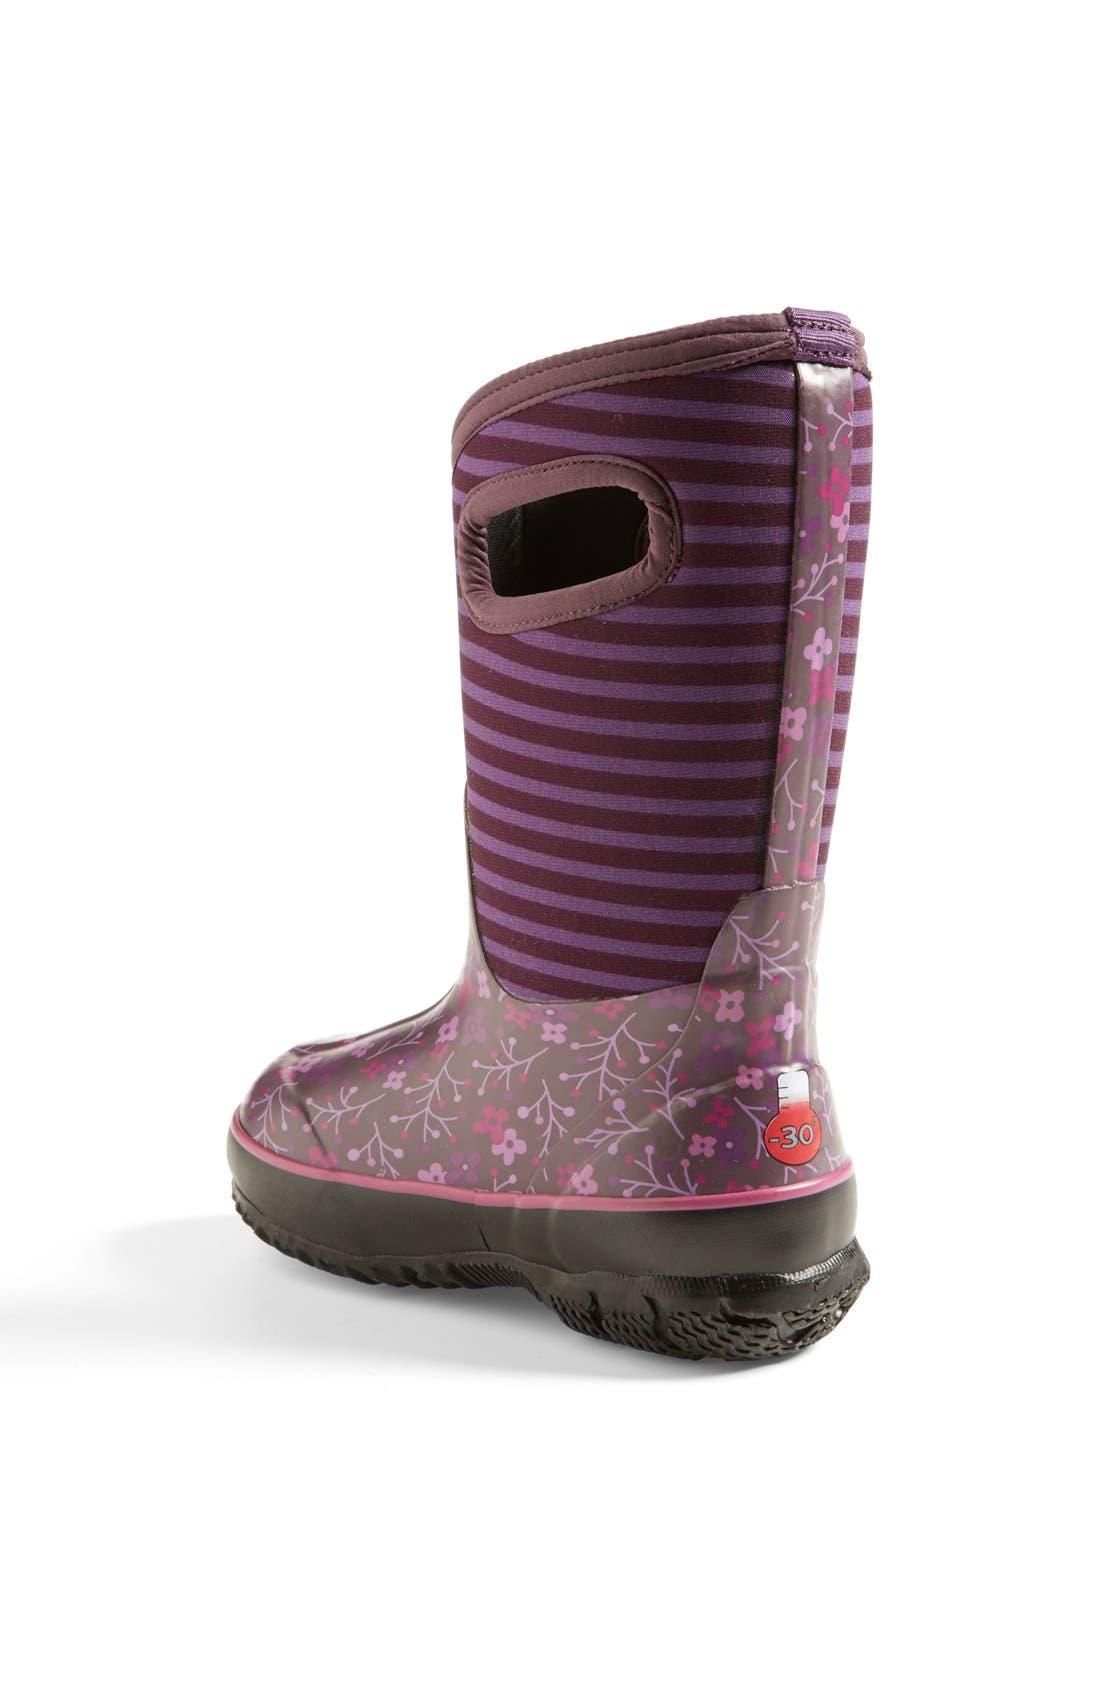 Alternate Image 2  - Bogs 'Classic - Flower Stripe' Waterproof Boot (Little Kid & Big Kid)